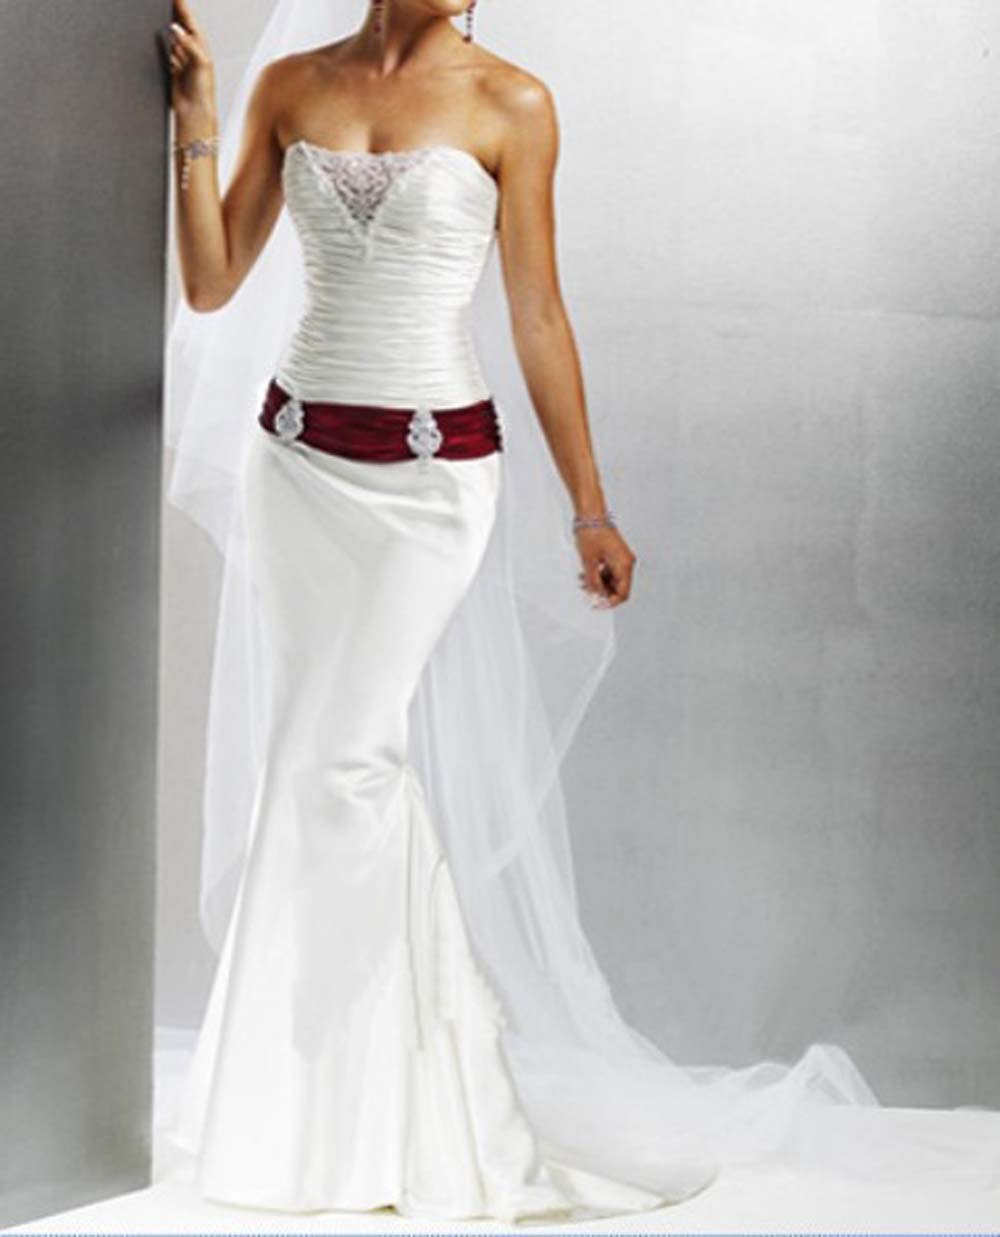 WESTERN WEDDING DRESSES ONLINE STYLISH WESTERN DRESSES FOR ...